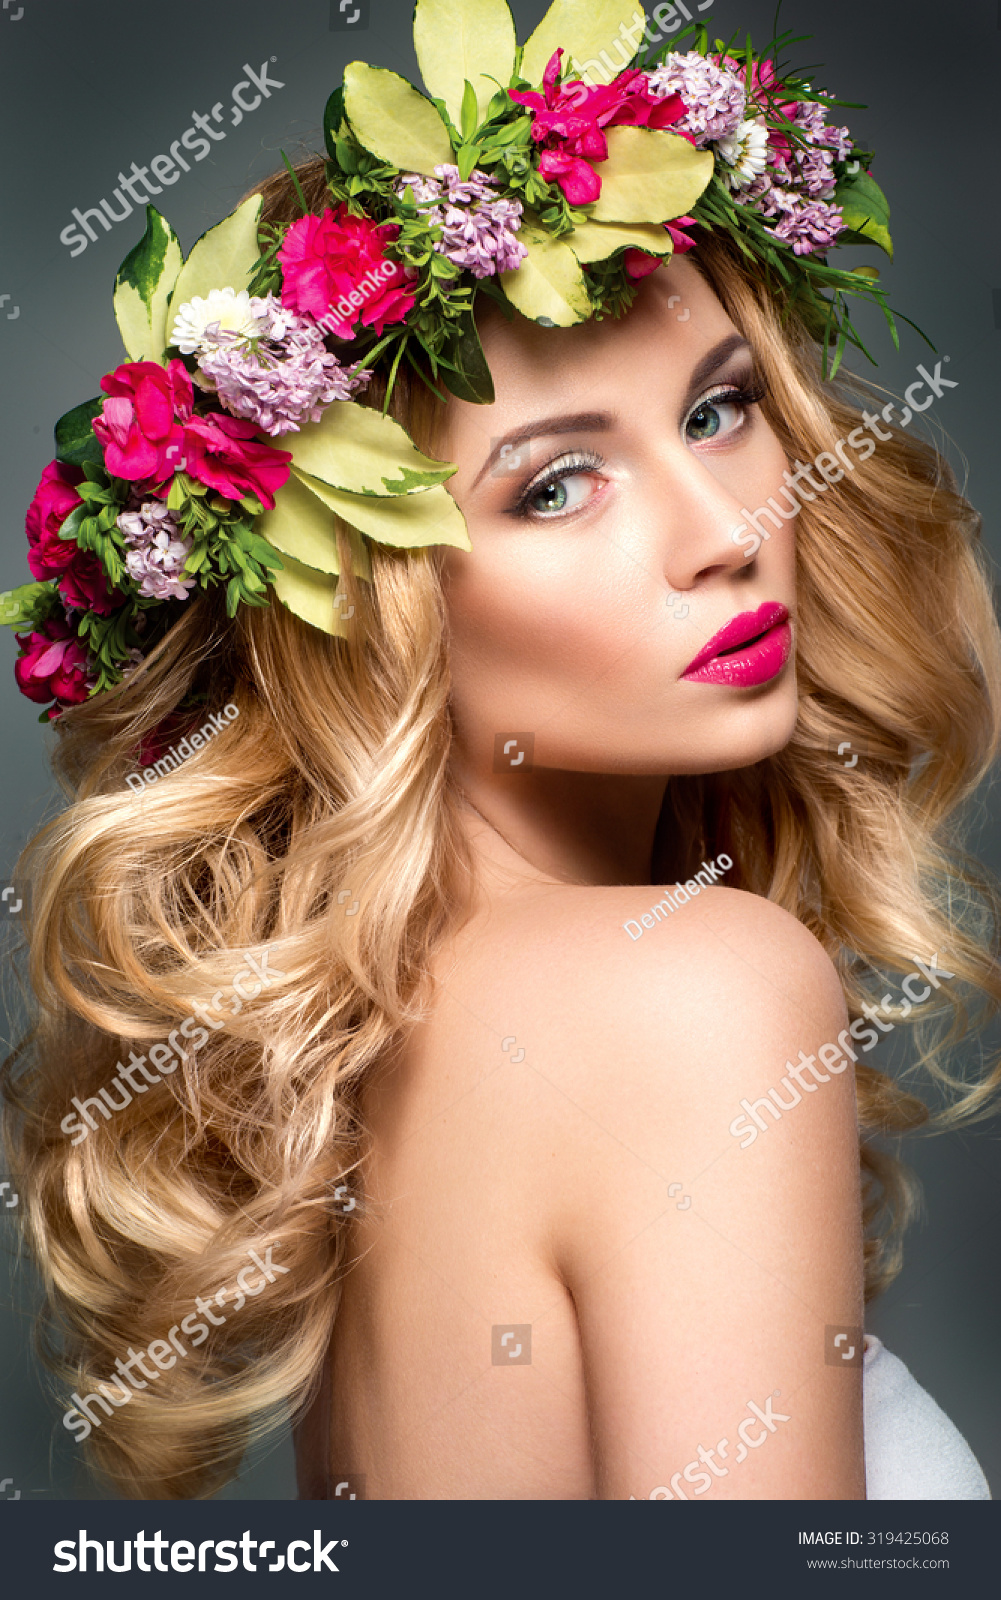 Beautiful woman flowers hair stock photo 100 legal protection beautiful woman with flowers in hair izmirmasajfo